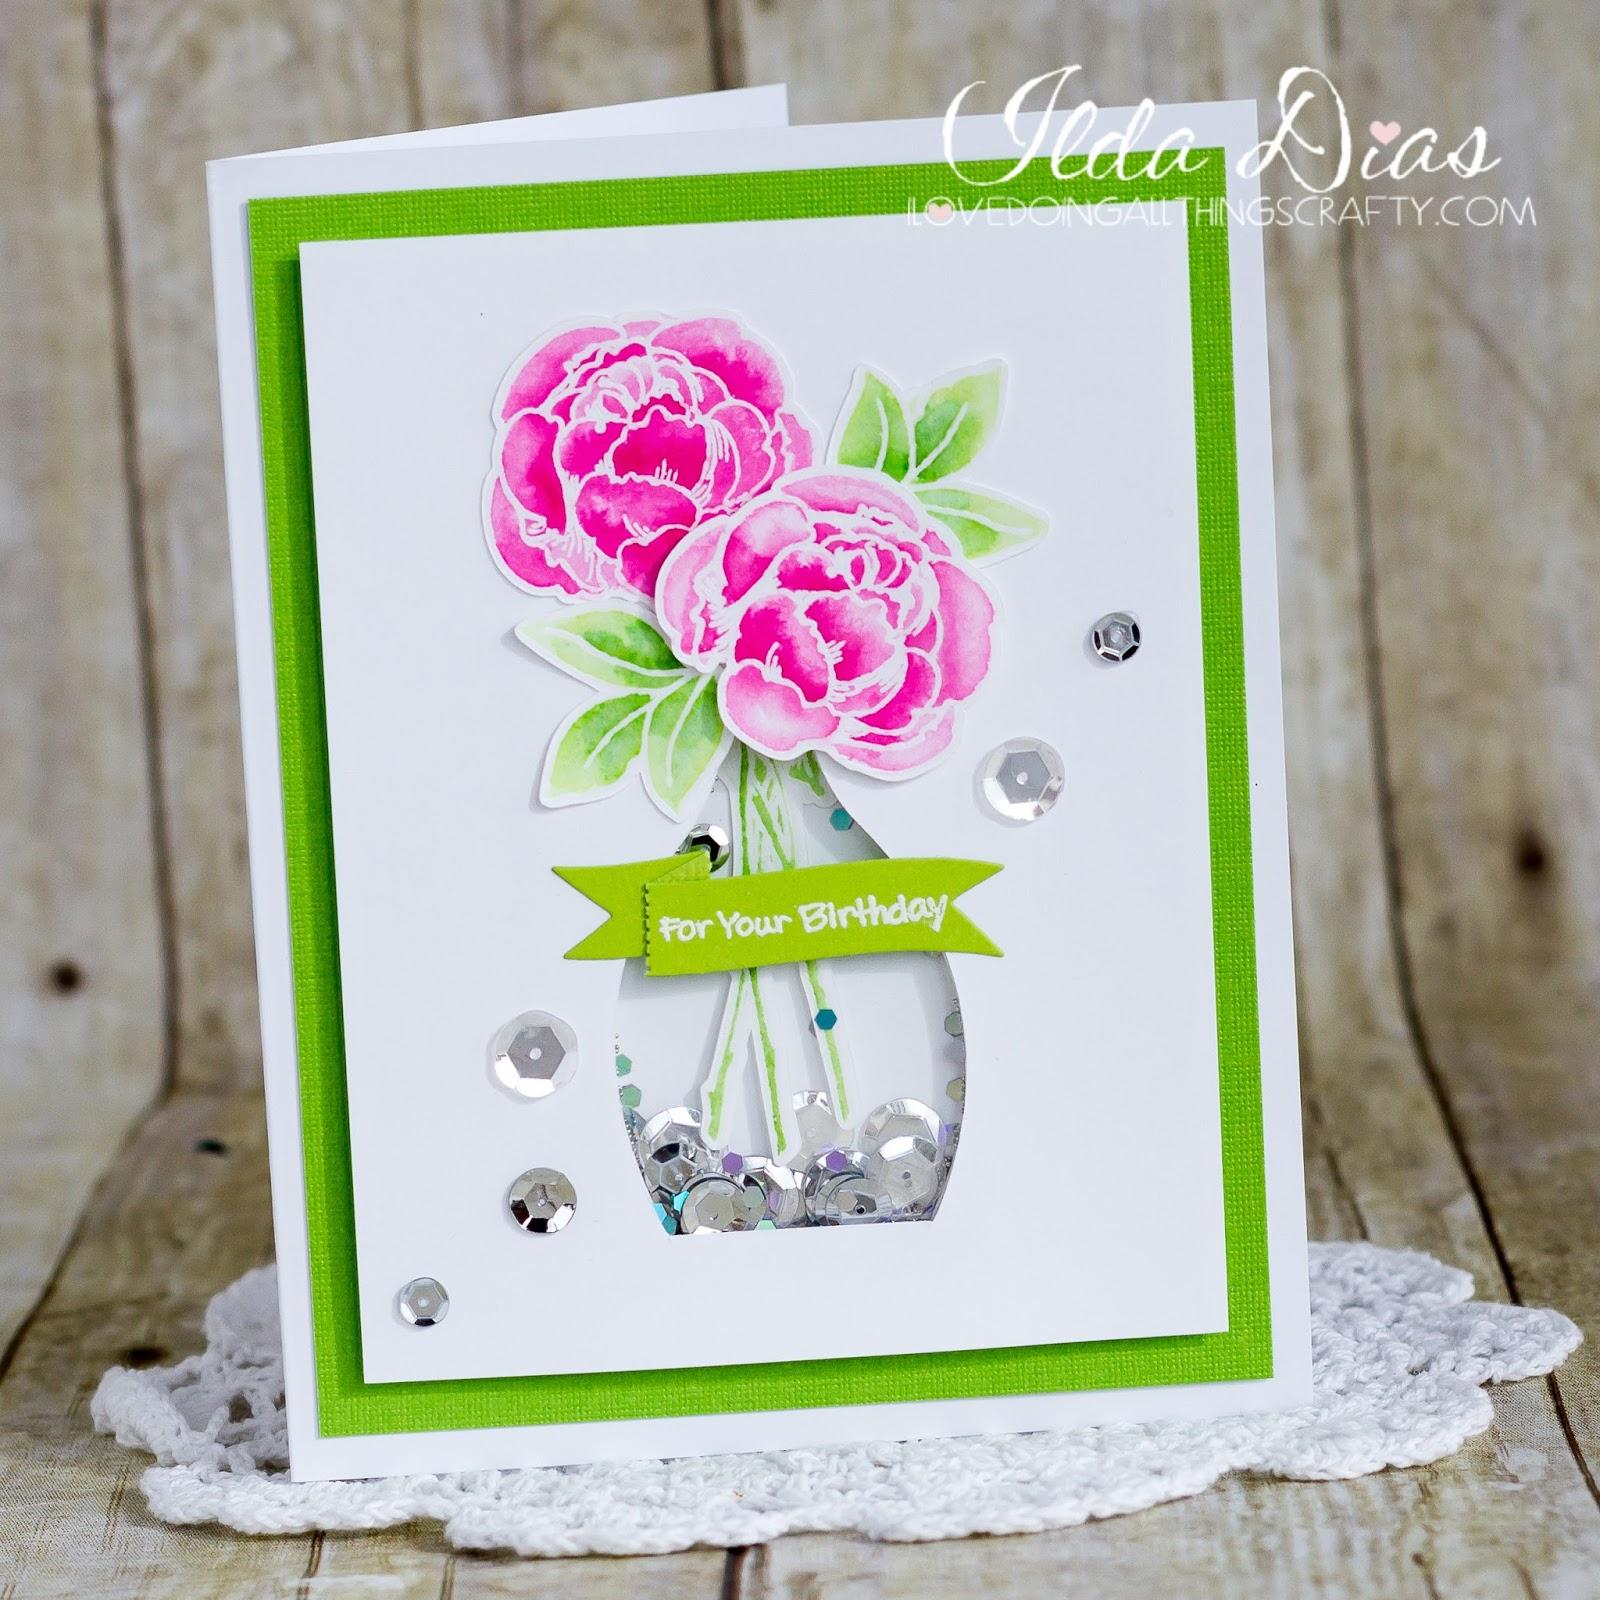 I love doing all things crafty diy flower vase shaker card diy flower vase shaker card izmirmasajfo